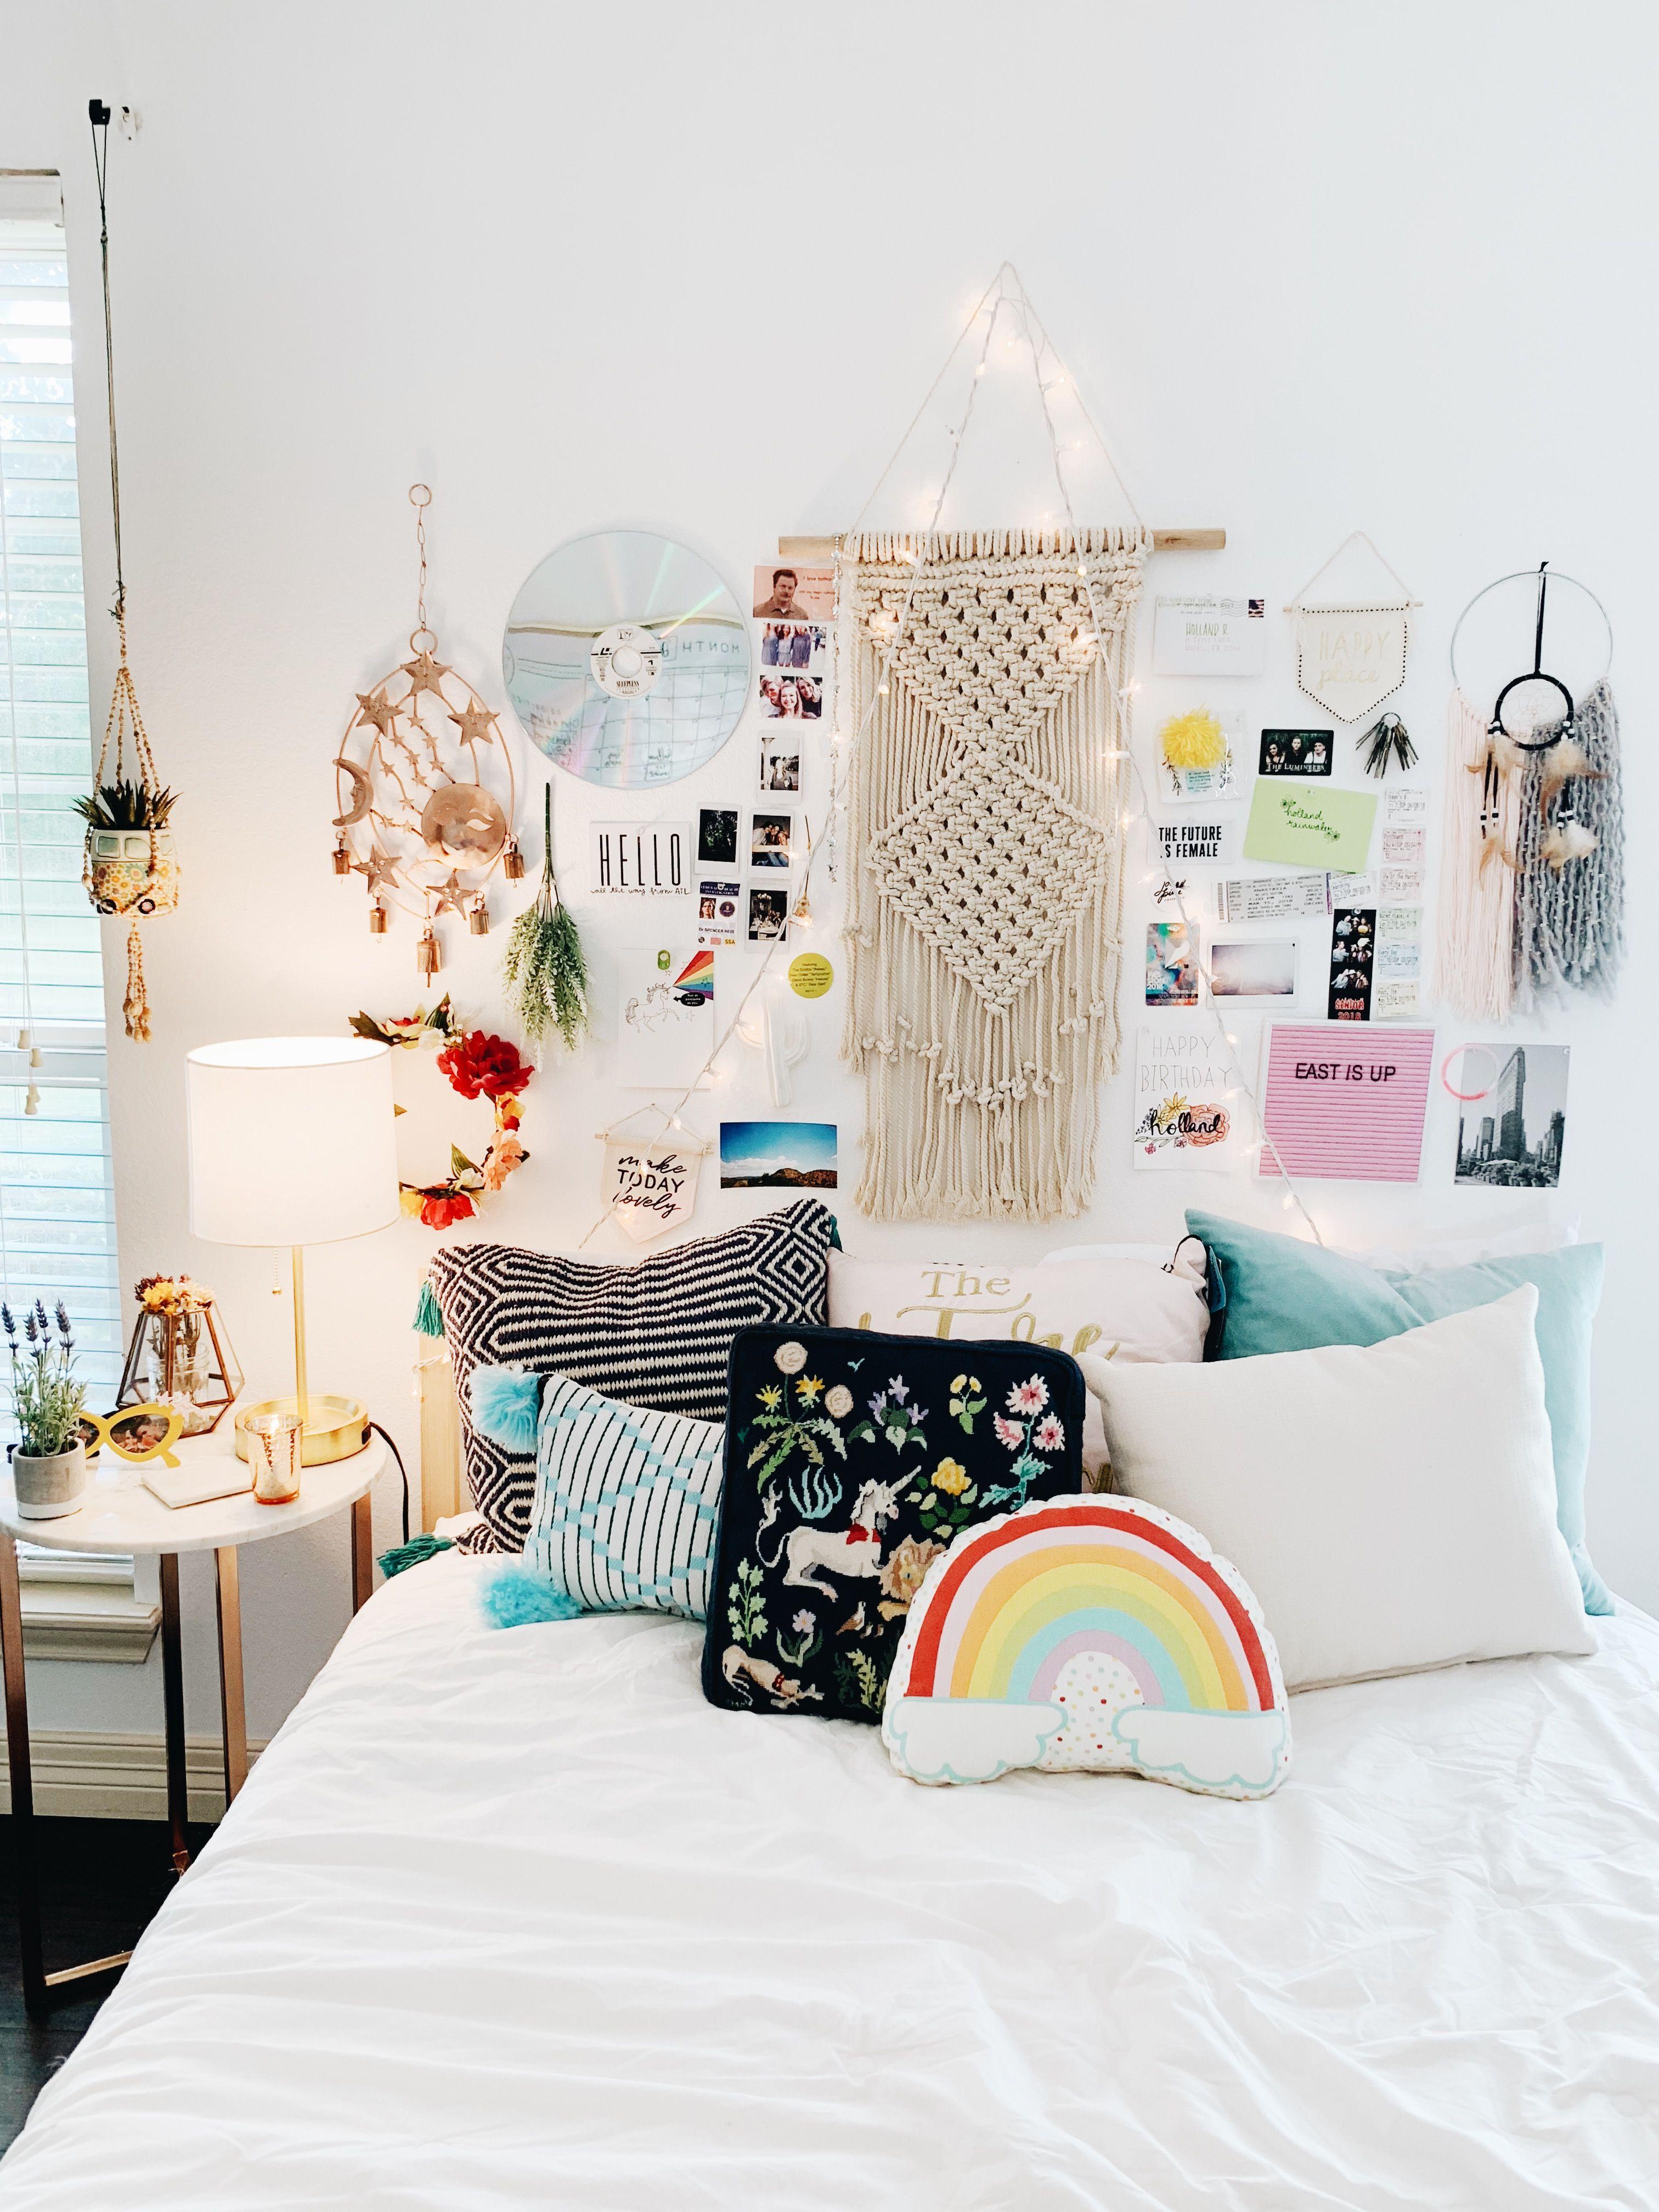 Dorm Themes Cozy Bed Pretty Room Goals Bedroom Inspo